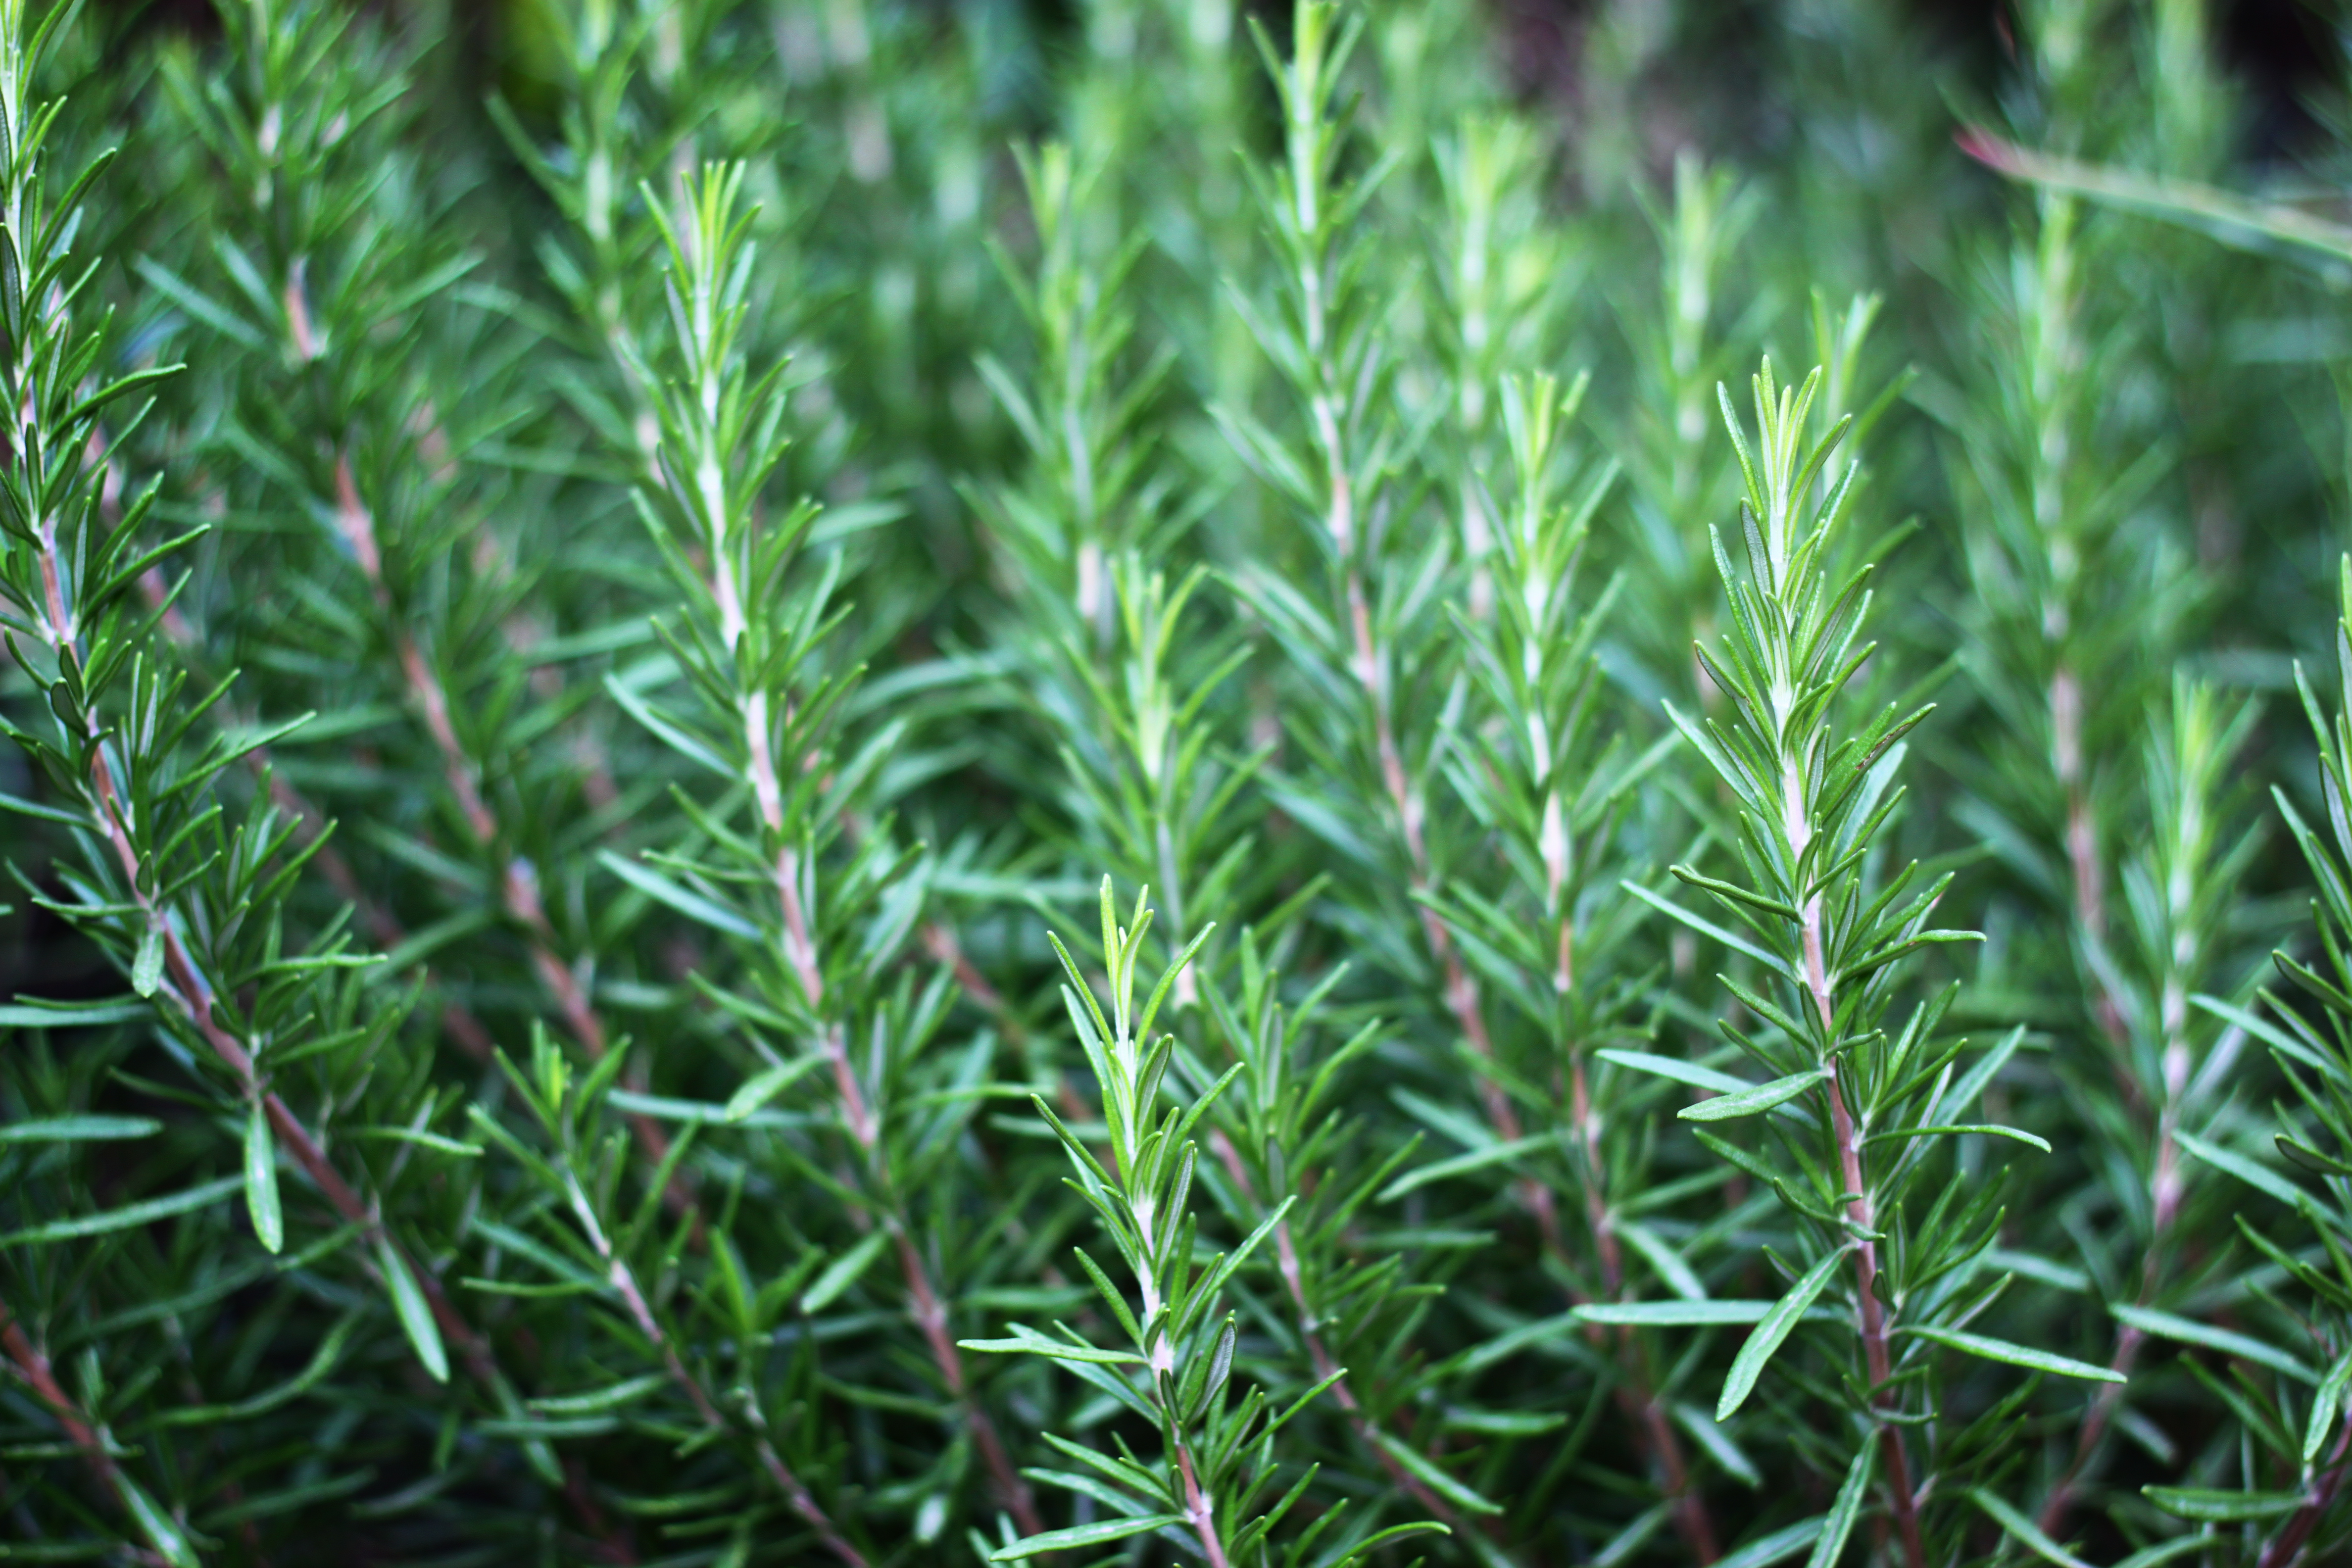 C mo plantar romero - Cultivar plantas aromaticas en casa ...